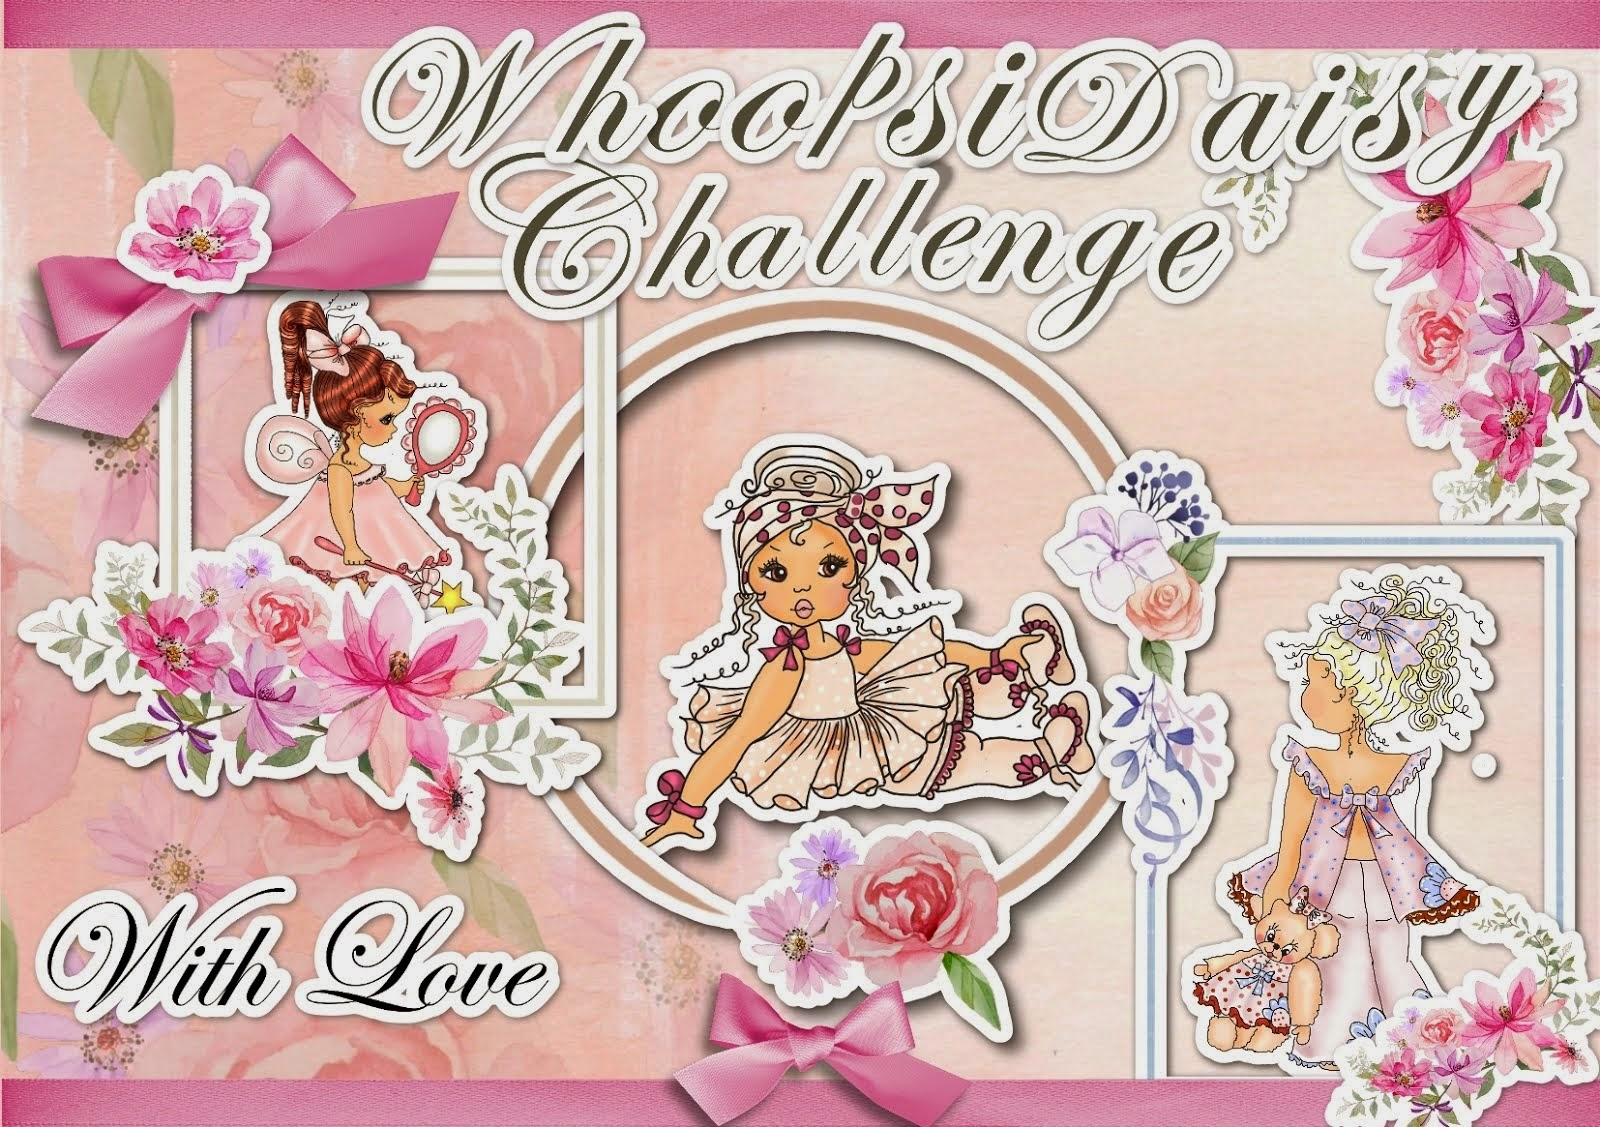 Whoopsiedaisy challenge